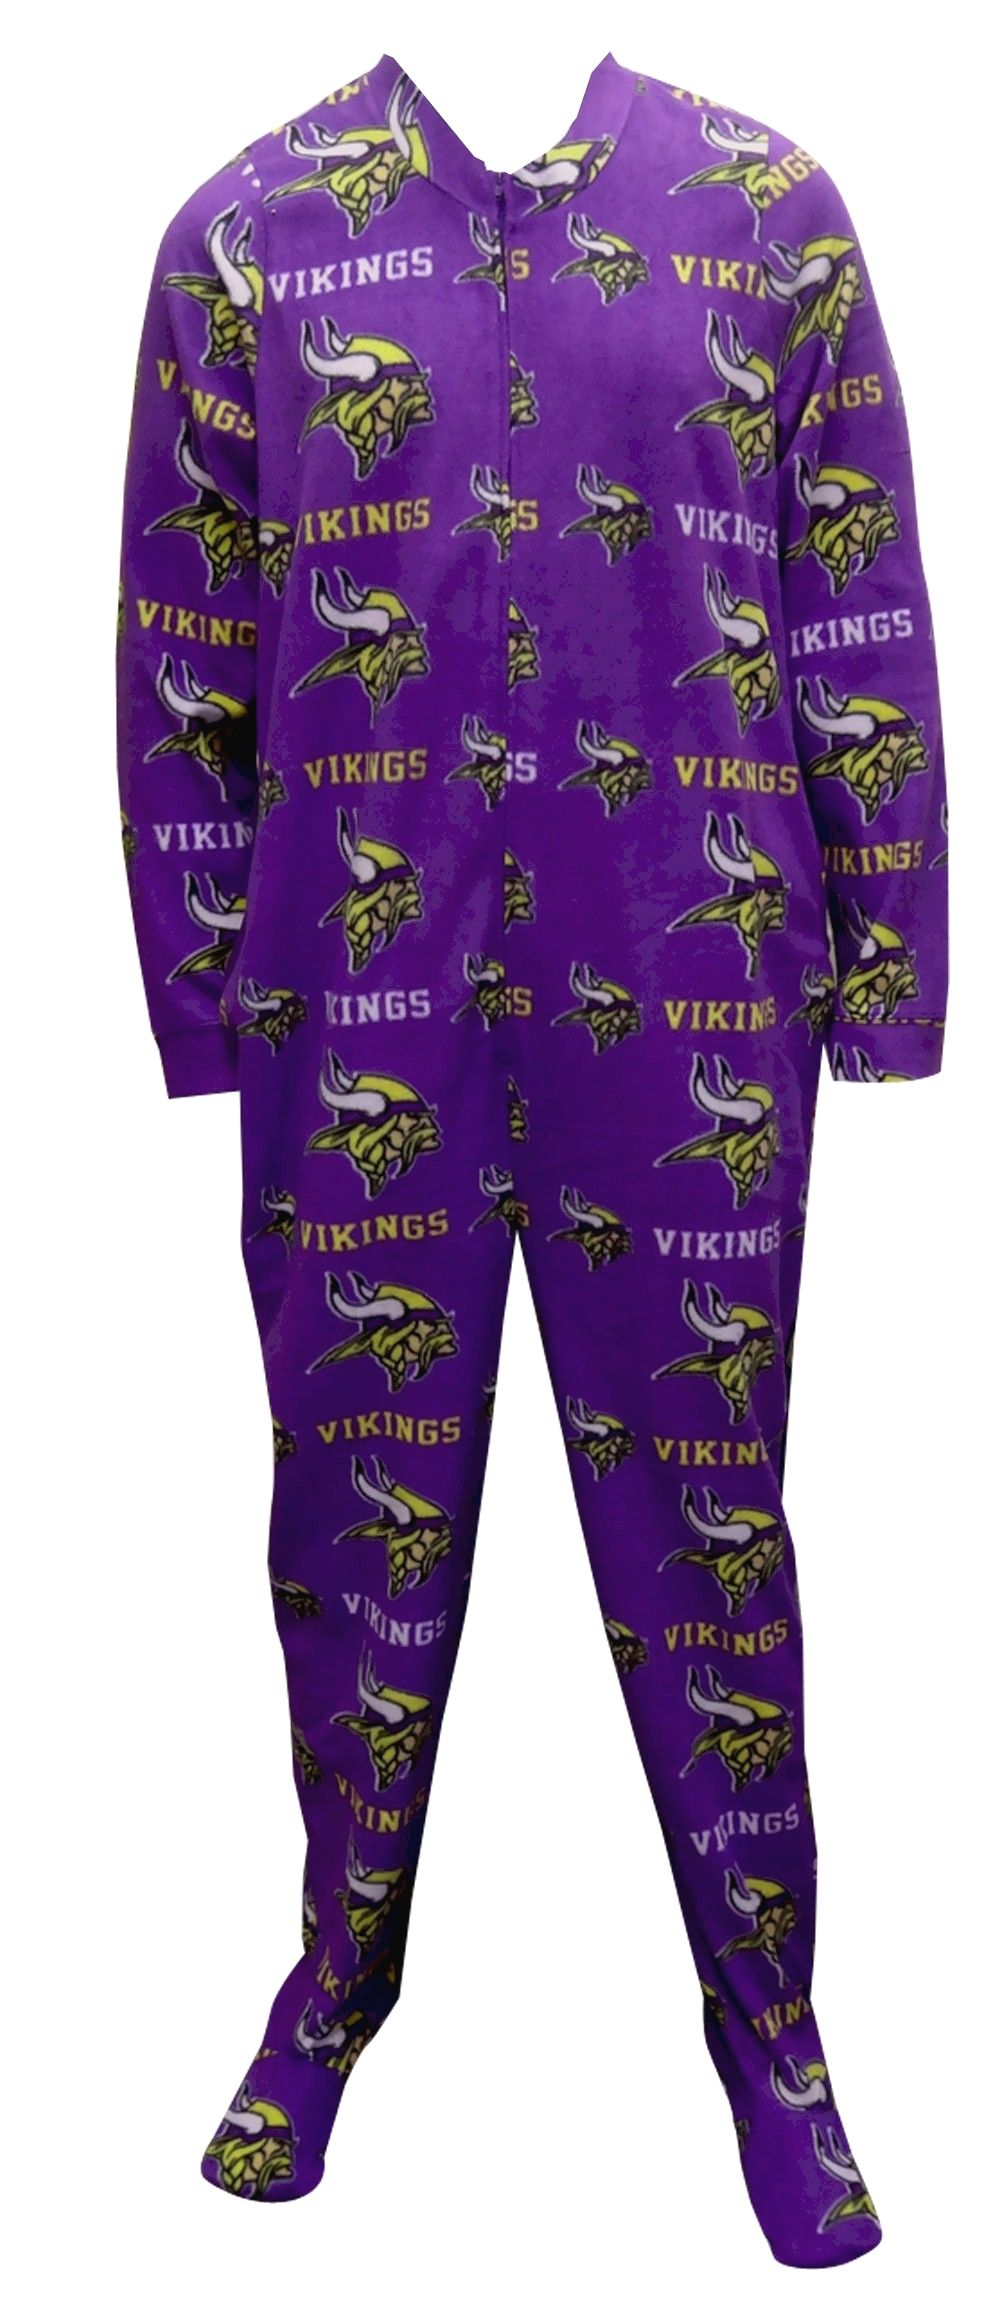 Footie pajamas for men